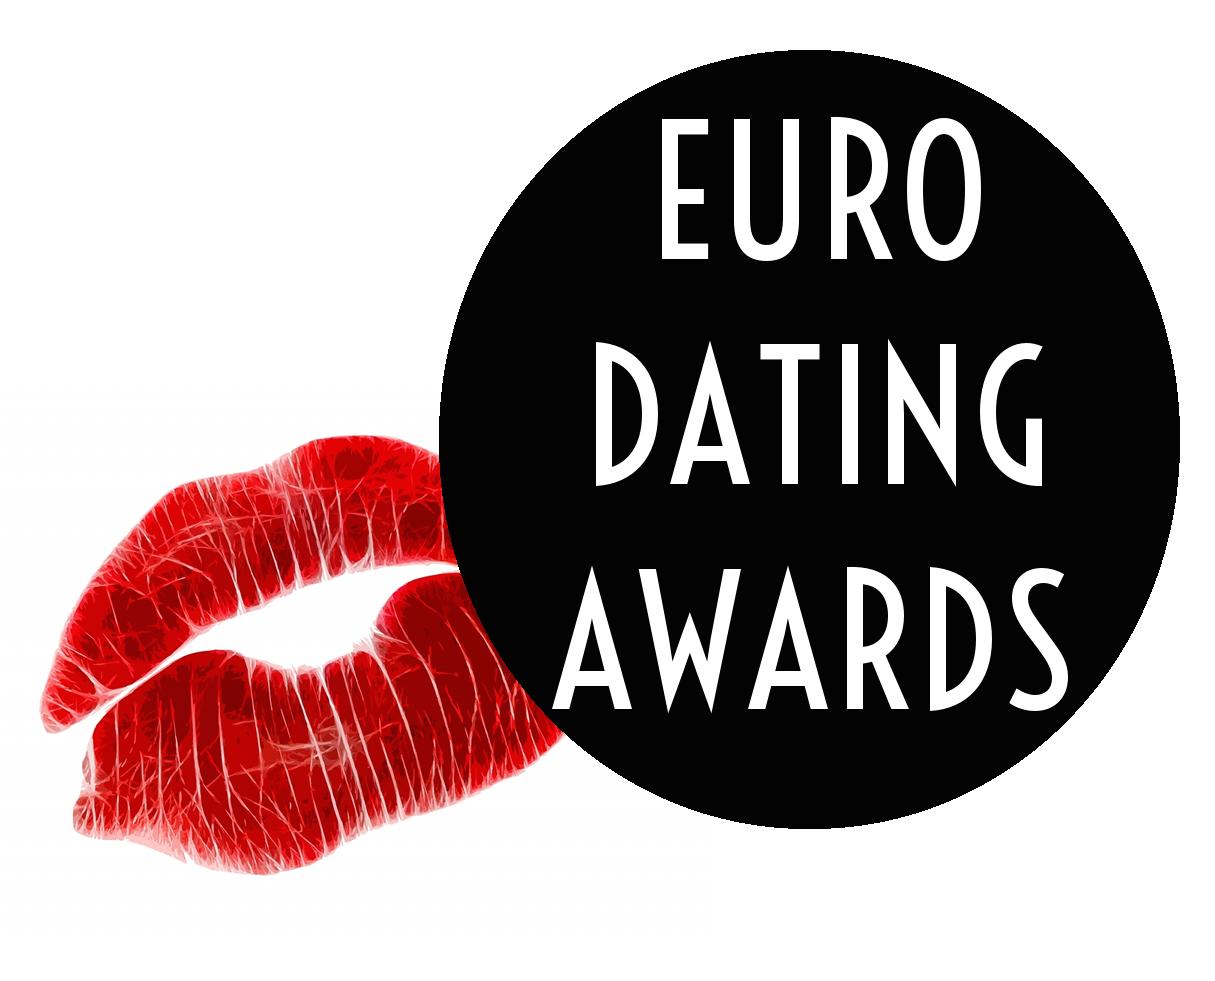 euro dating